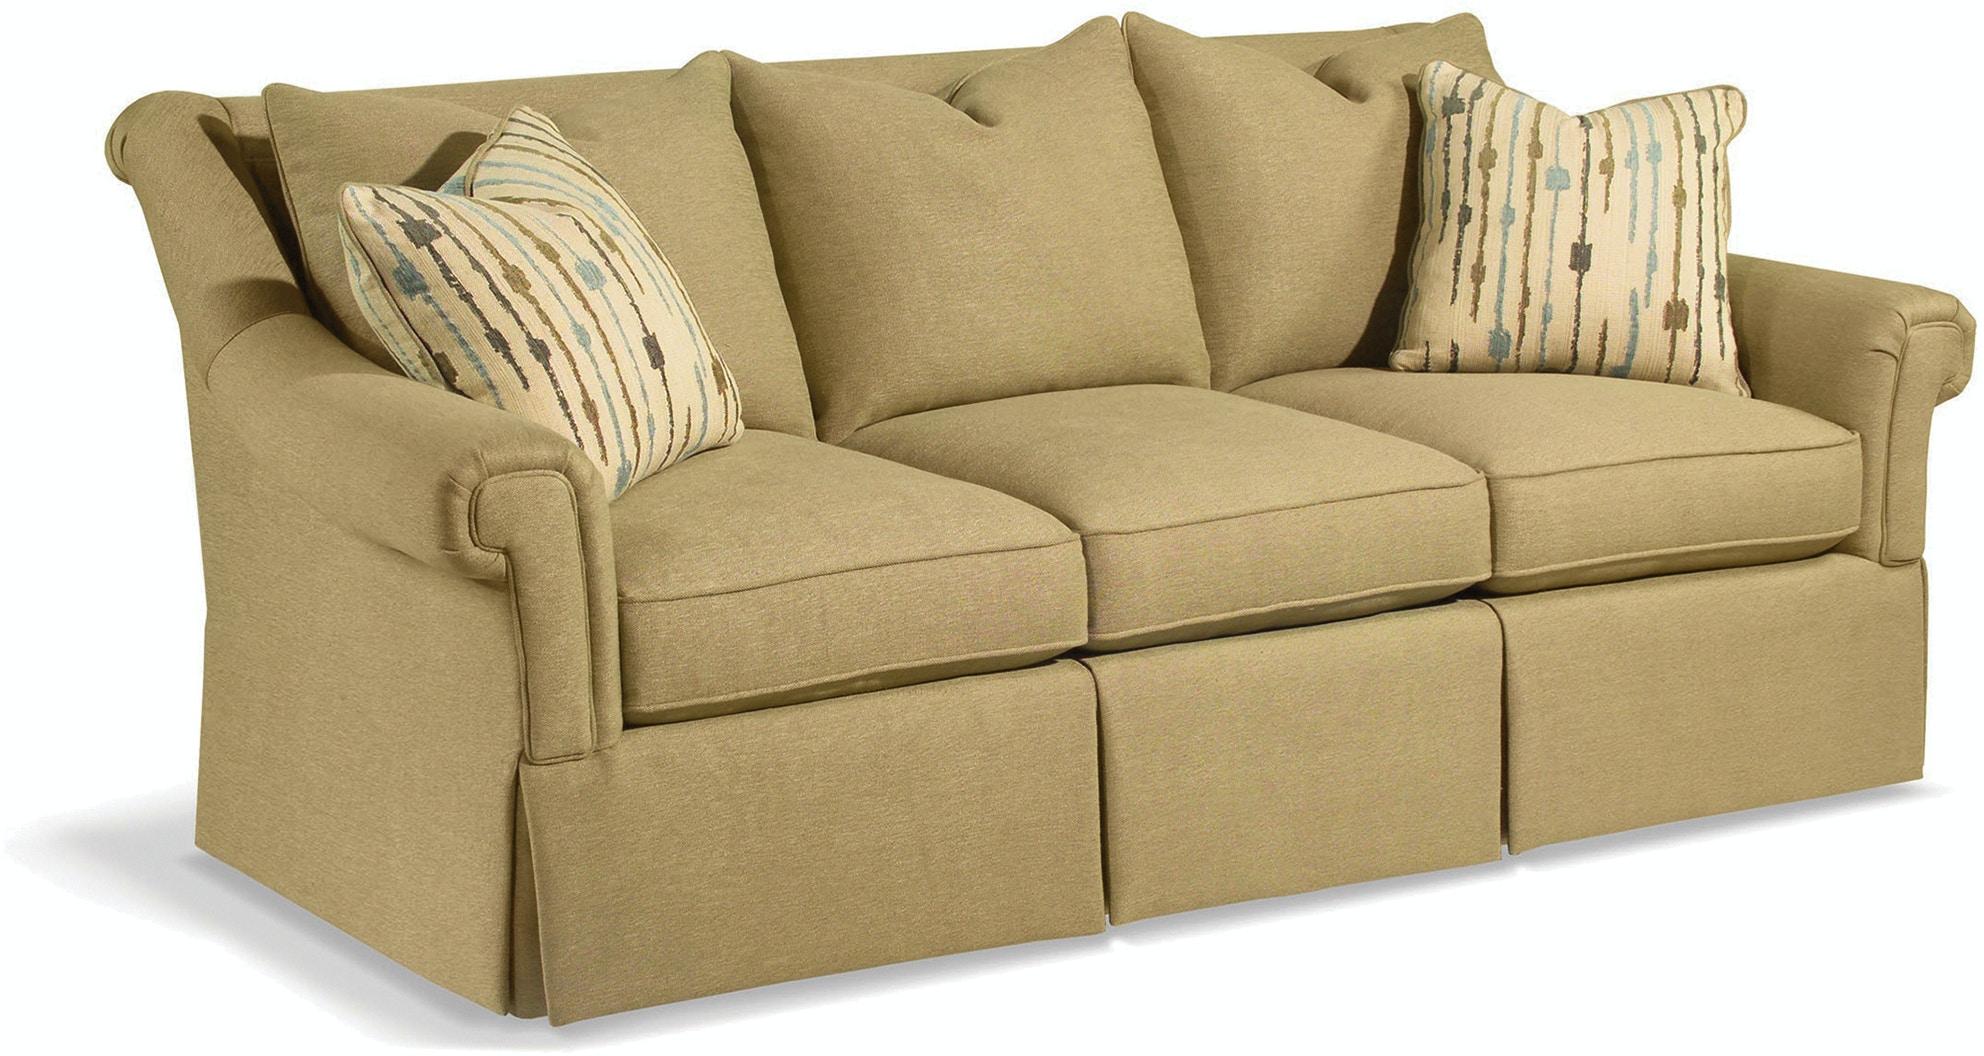 Taylor King Furniture 1020 03 Living Room Ainsworth Sofa